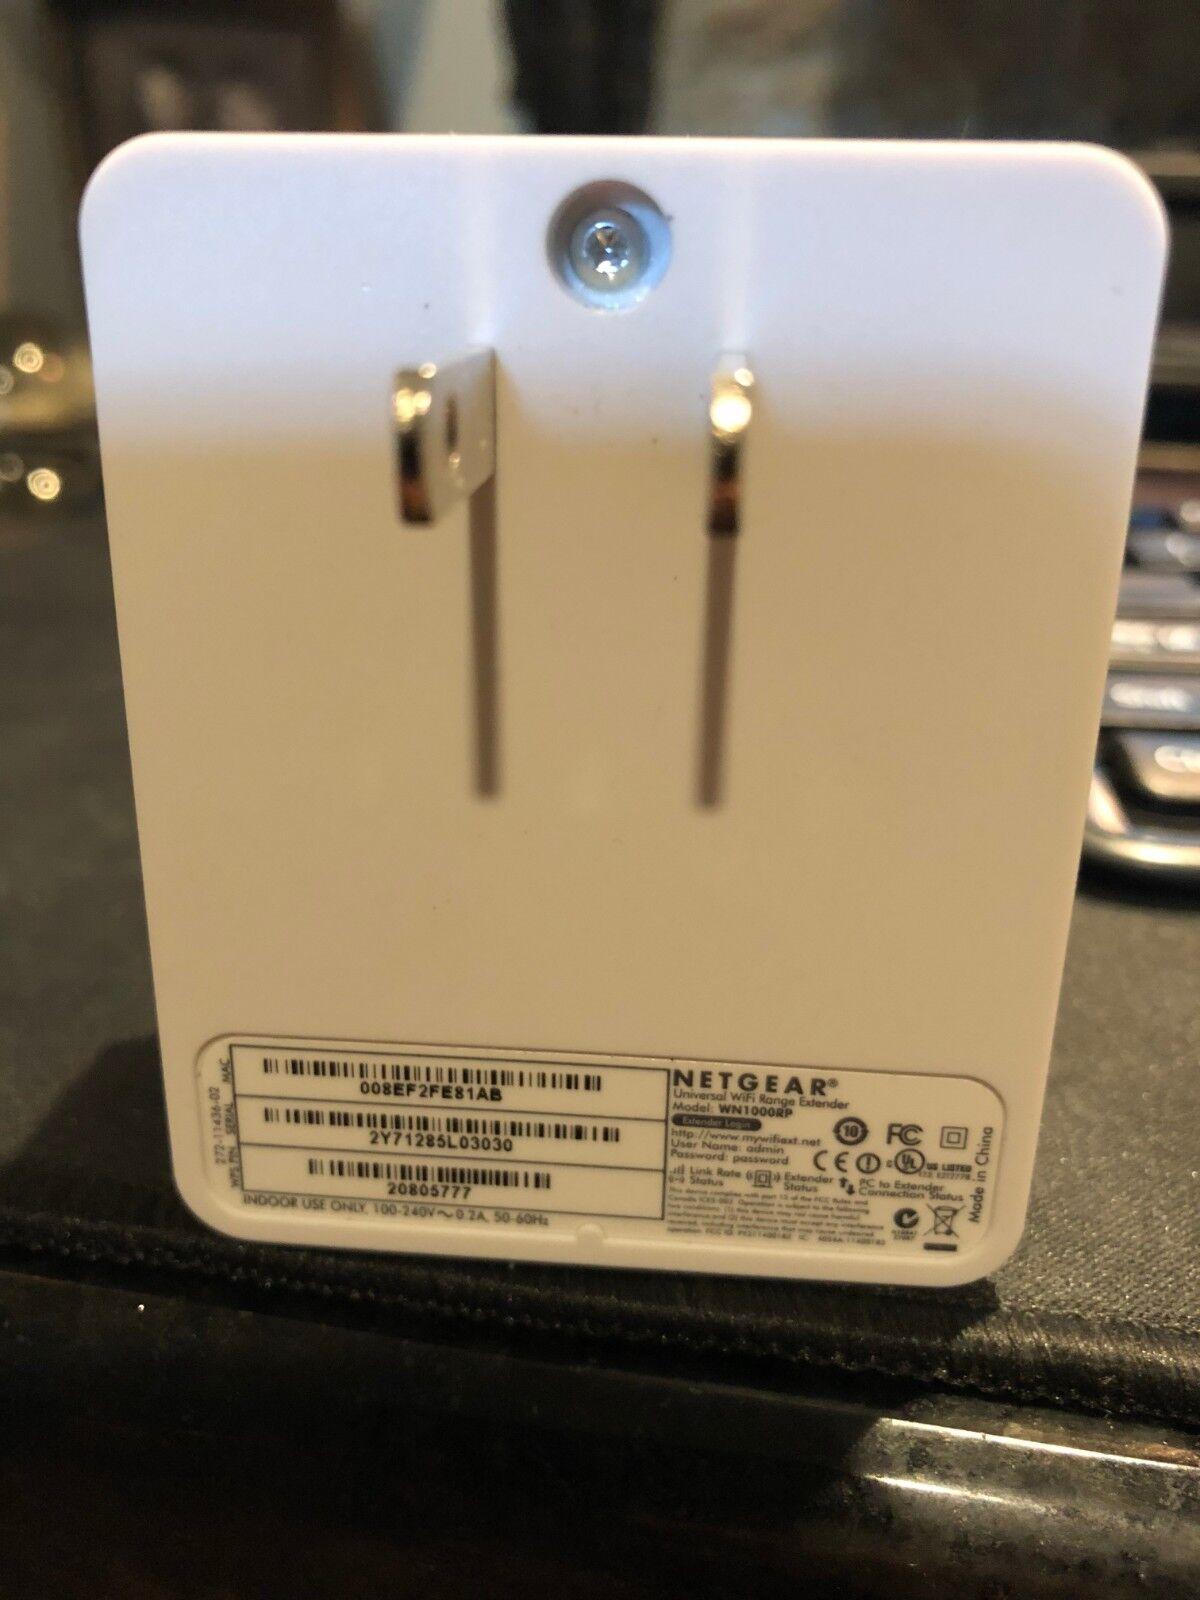 Netgear Universal WiFi Range Extender WN1000RP